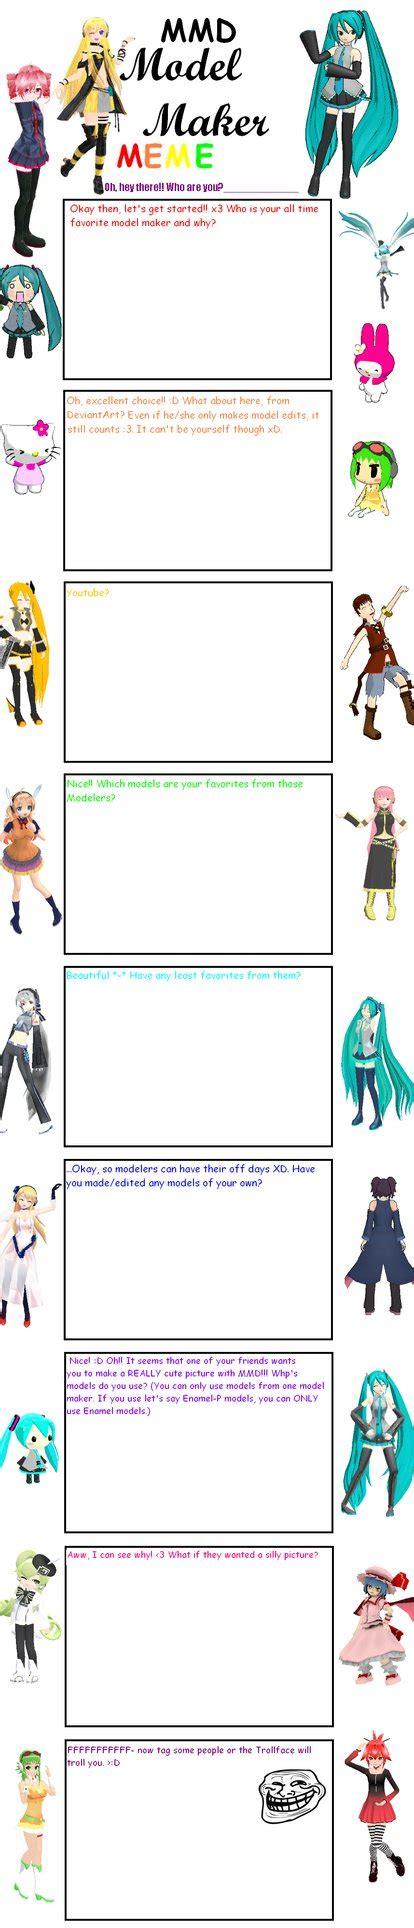 blank meme maker 28 images blank imgflip blank